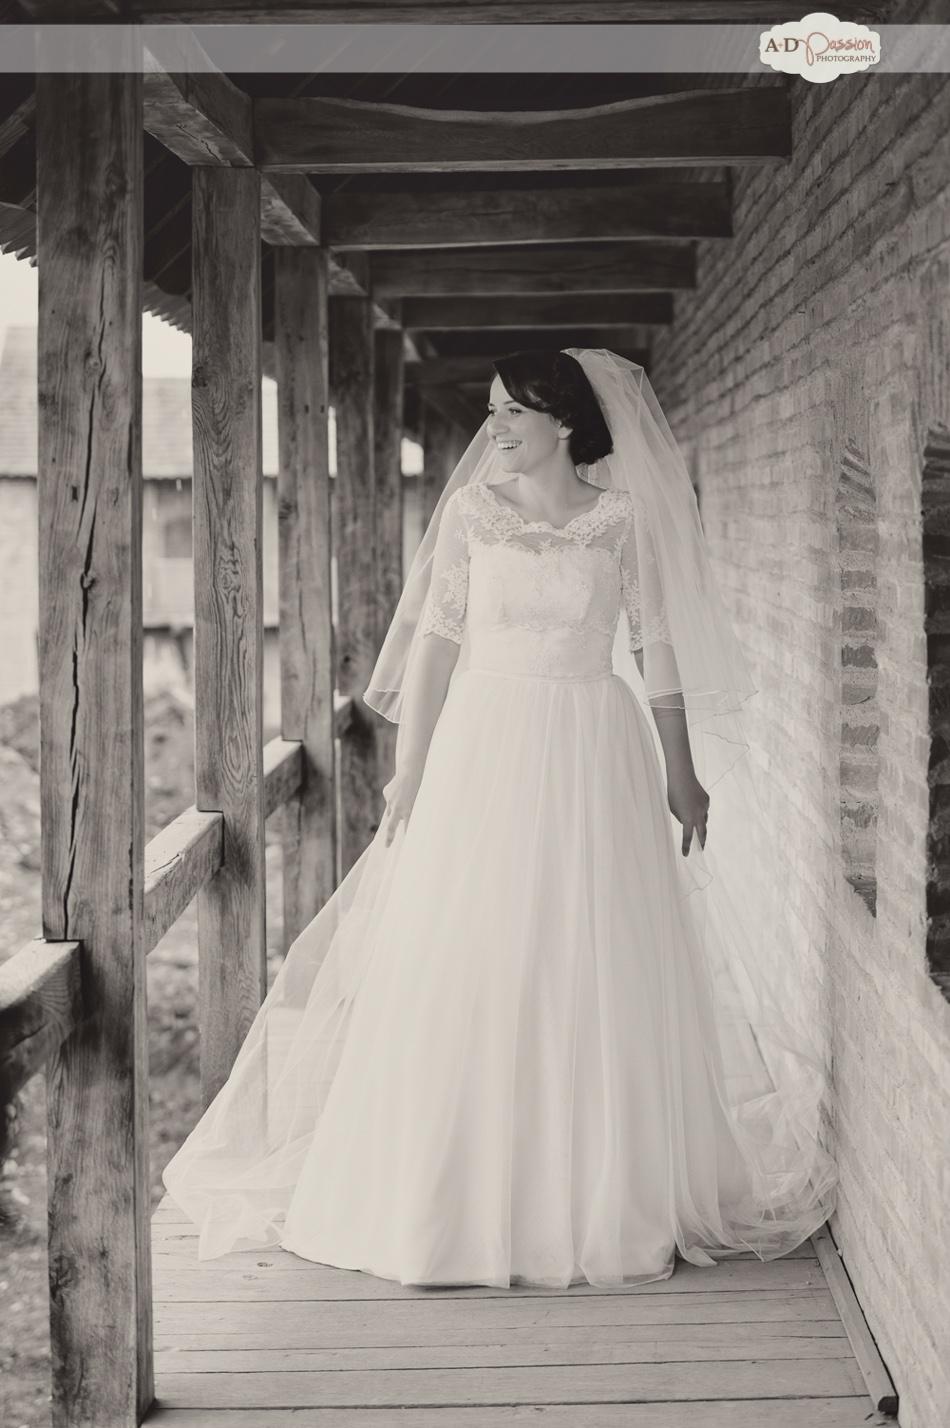 AD Passion Photography | fotograf-nunta_flavian-si-alina_nunta-targu-mures_0063 | Adelin, Dida, fotograf profesionist, fotograf de nunta, fotografie de nunta, fotograf Timisoara, fotograf Craiova, fotograf Bucuresti, fotograf Arad, nunta Timisoara, nunta Arad, nunta Bucuresti, nunta Craiova